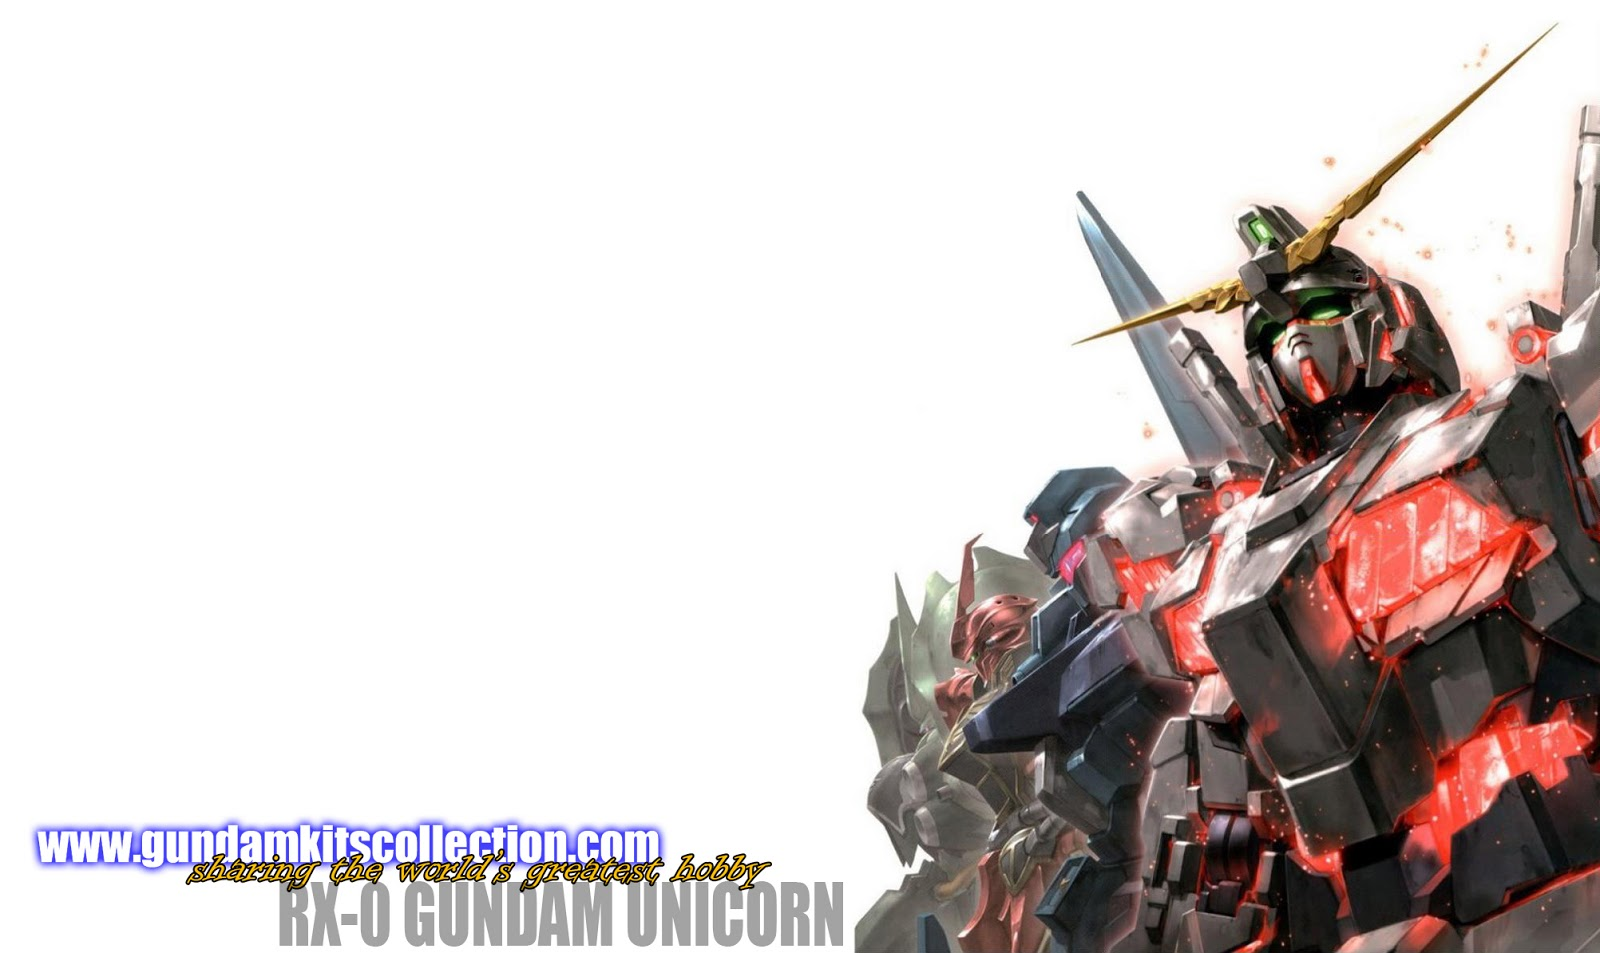 Gundam unicorn and banshee wallpaper gundam kits